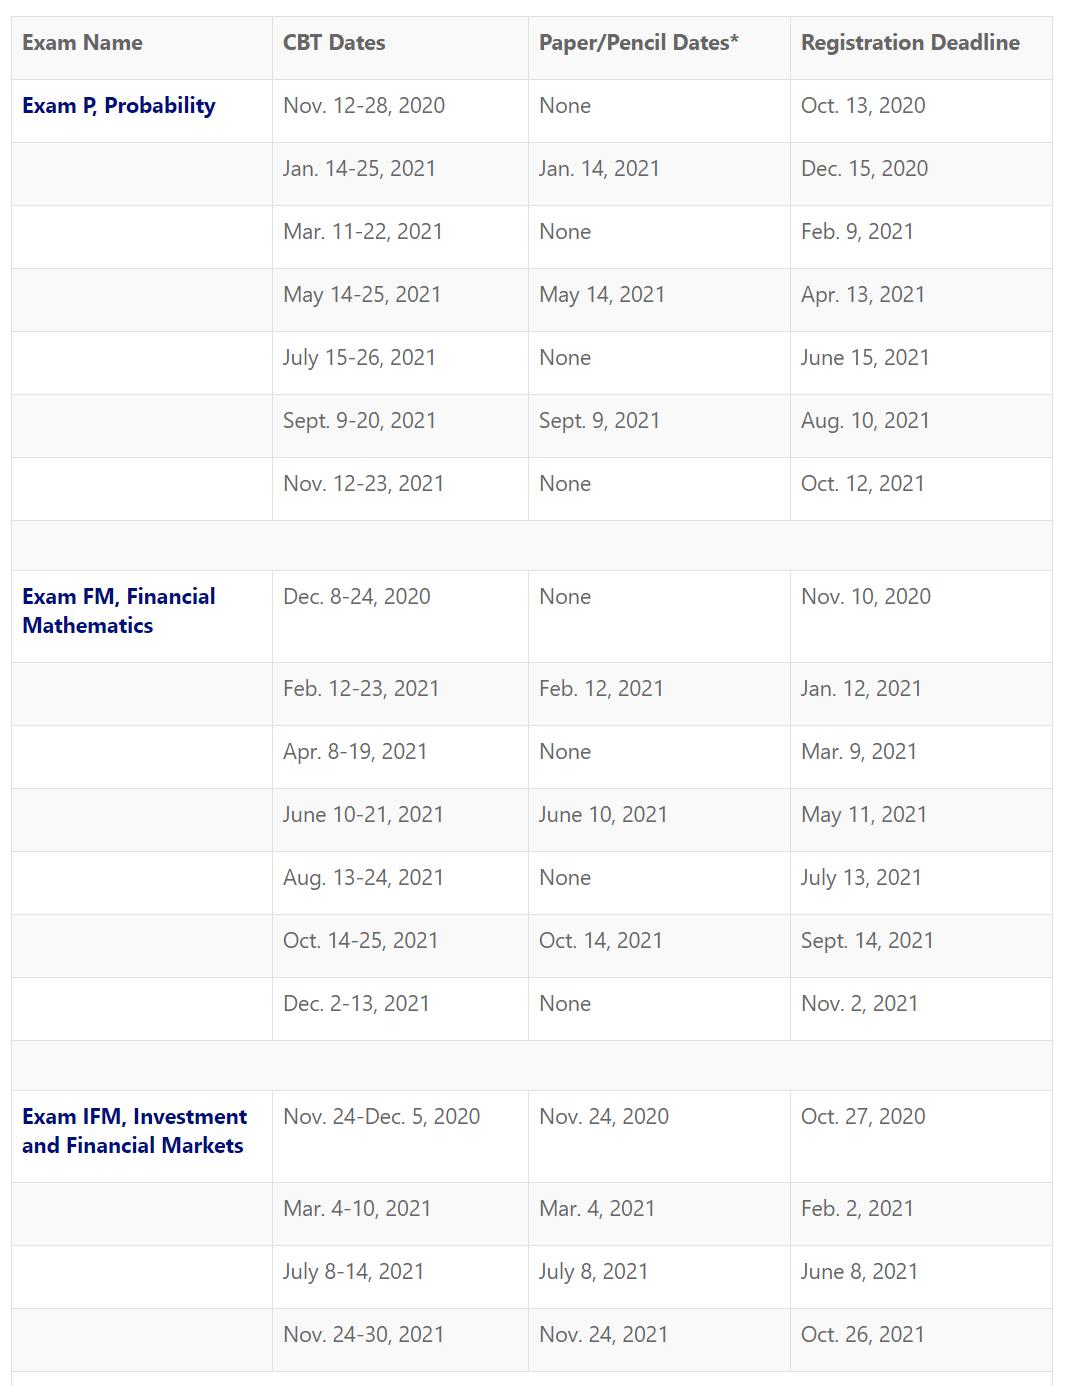 2021 Registration Deadline and Exam Dates